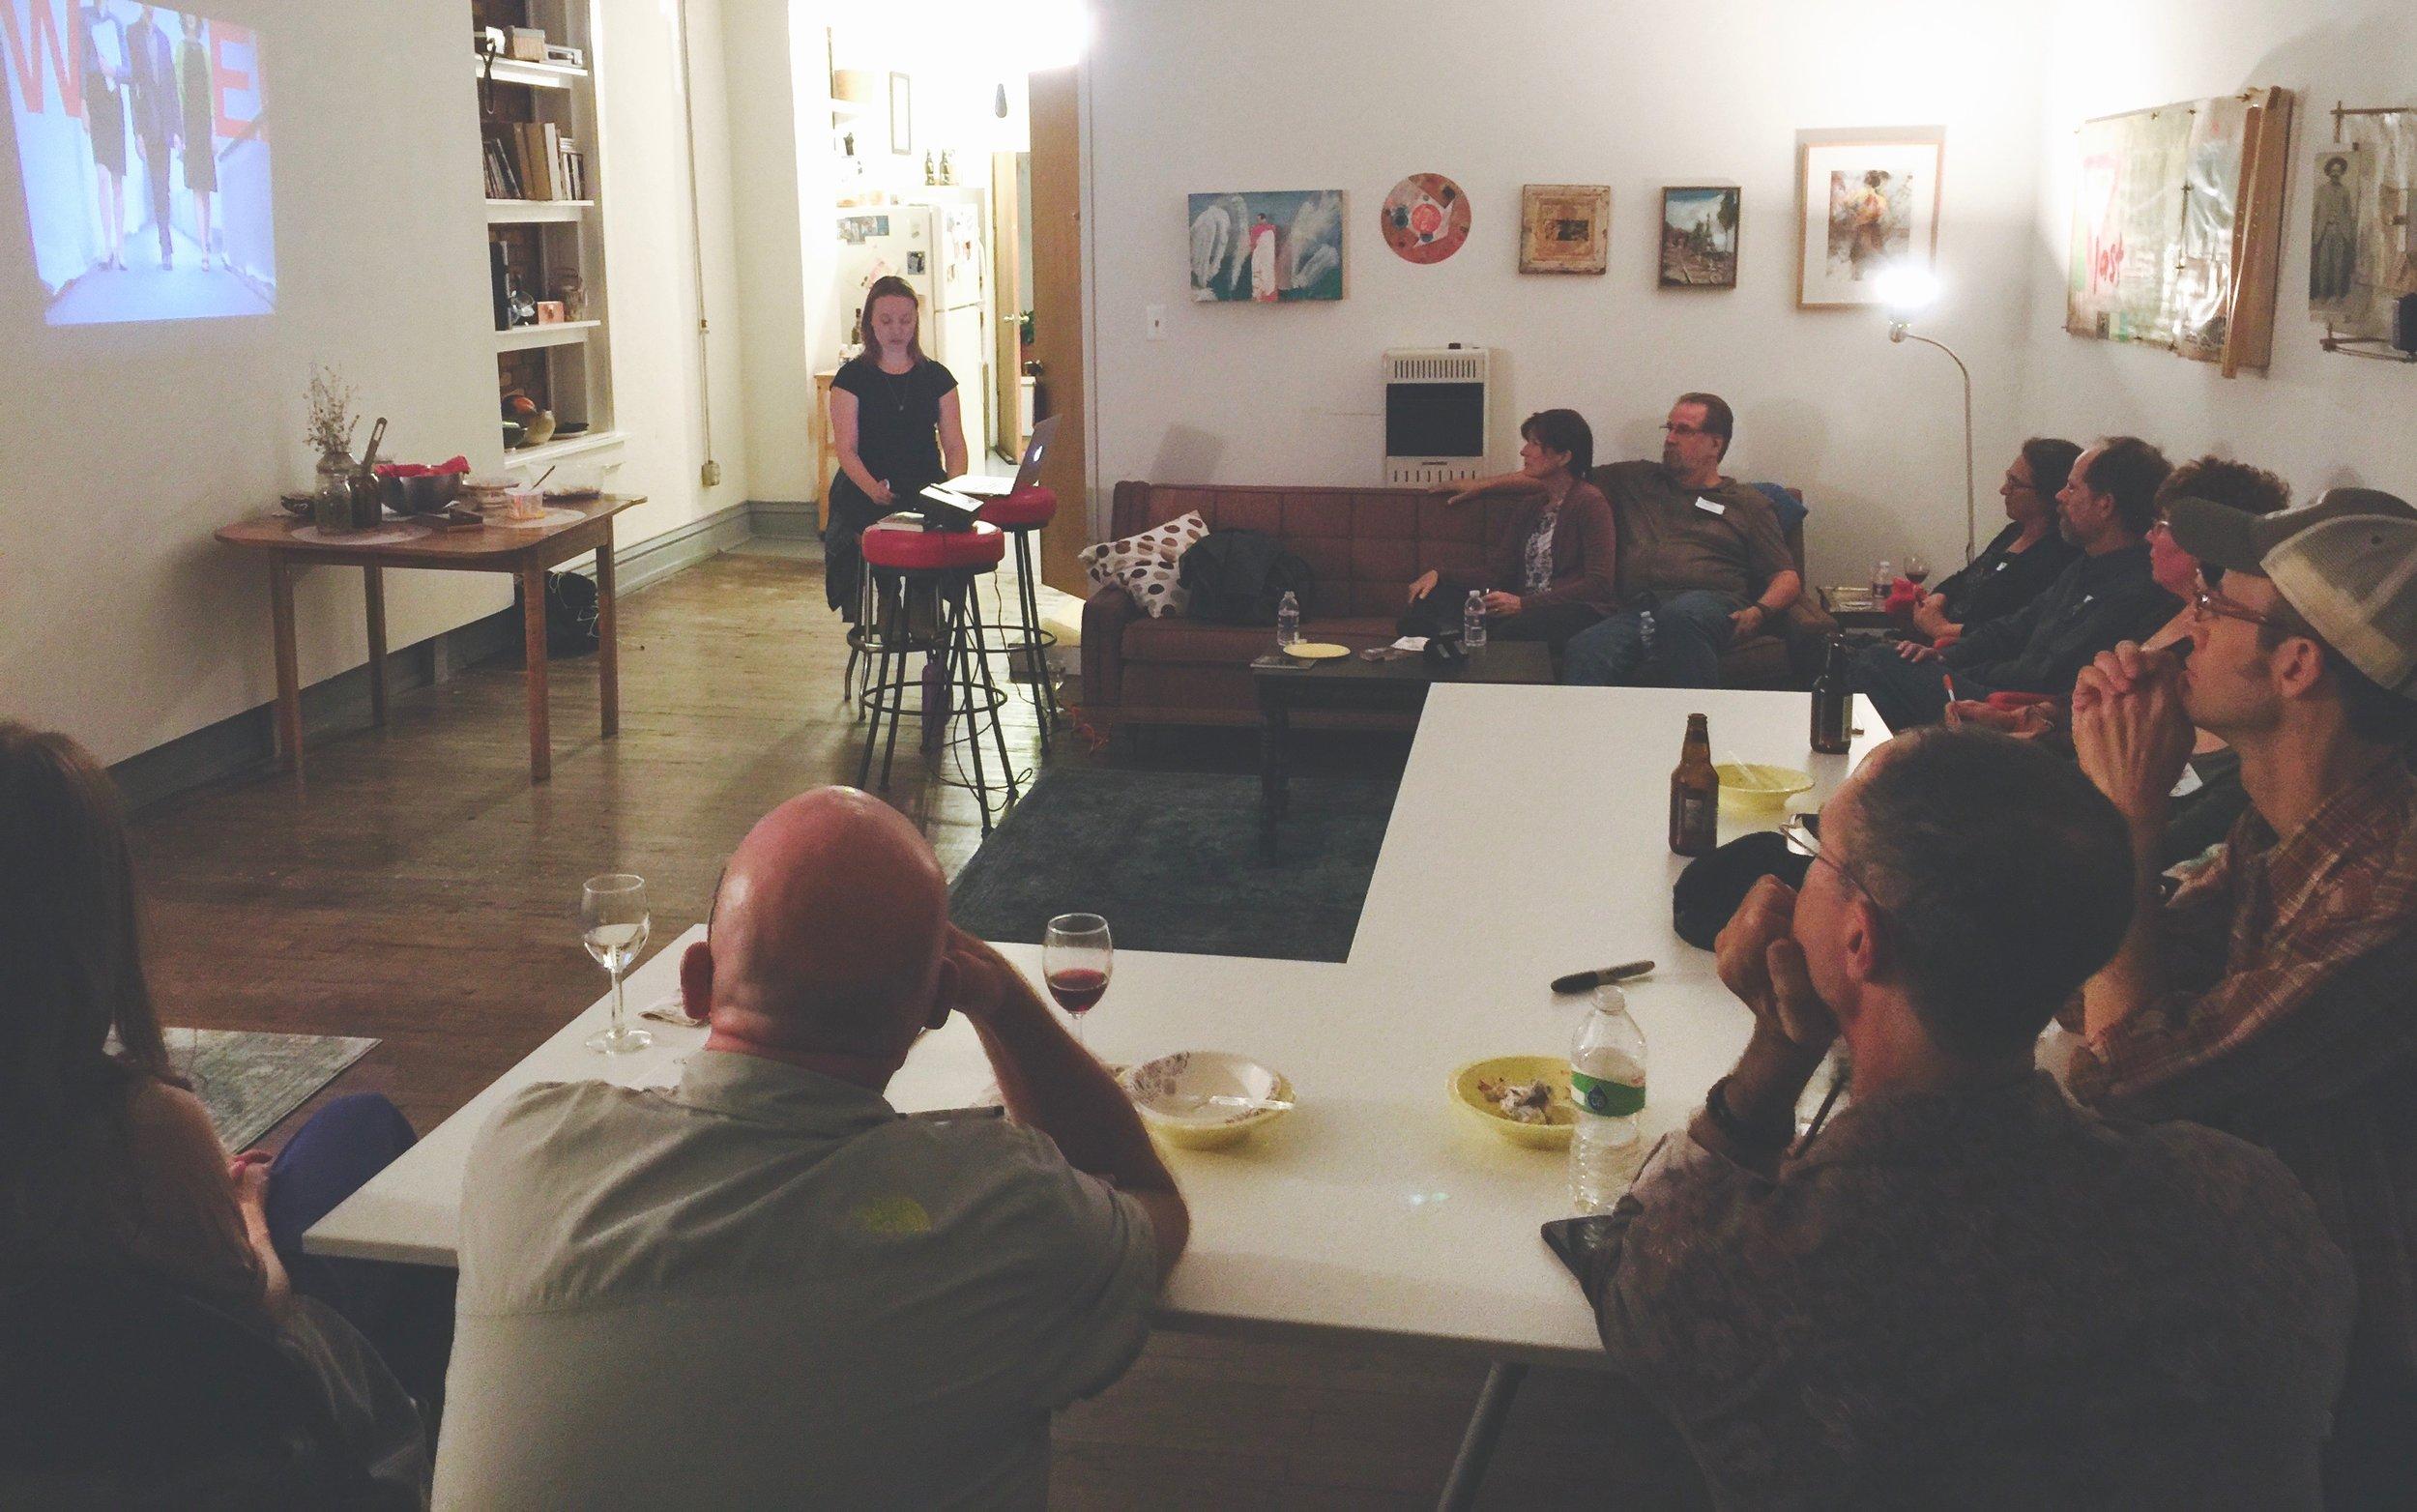 Jane Gotch on Leveraging Community